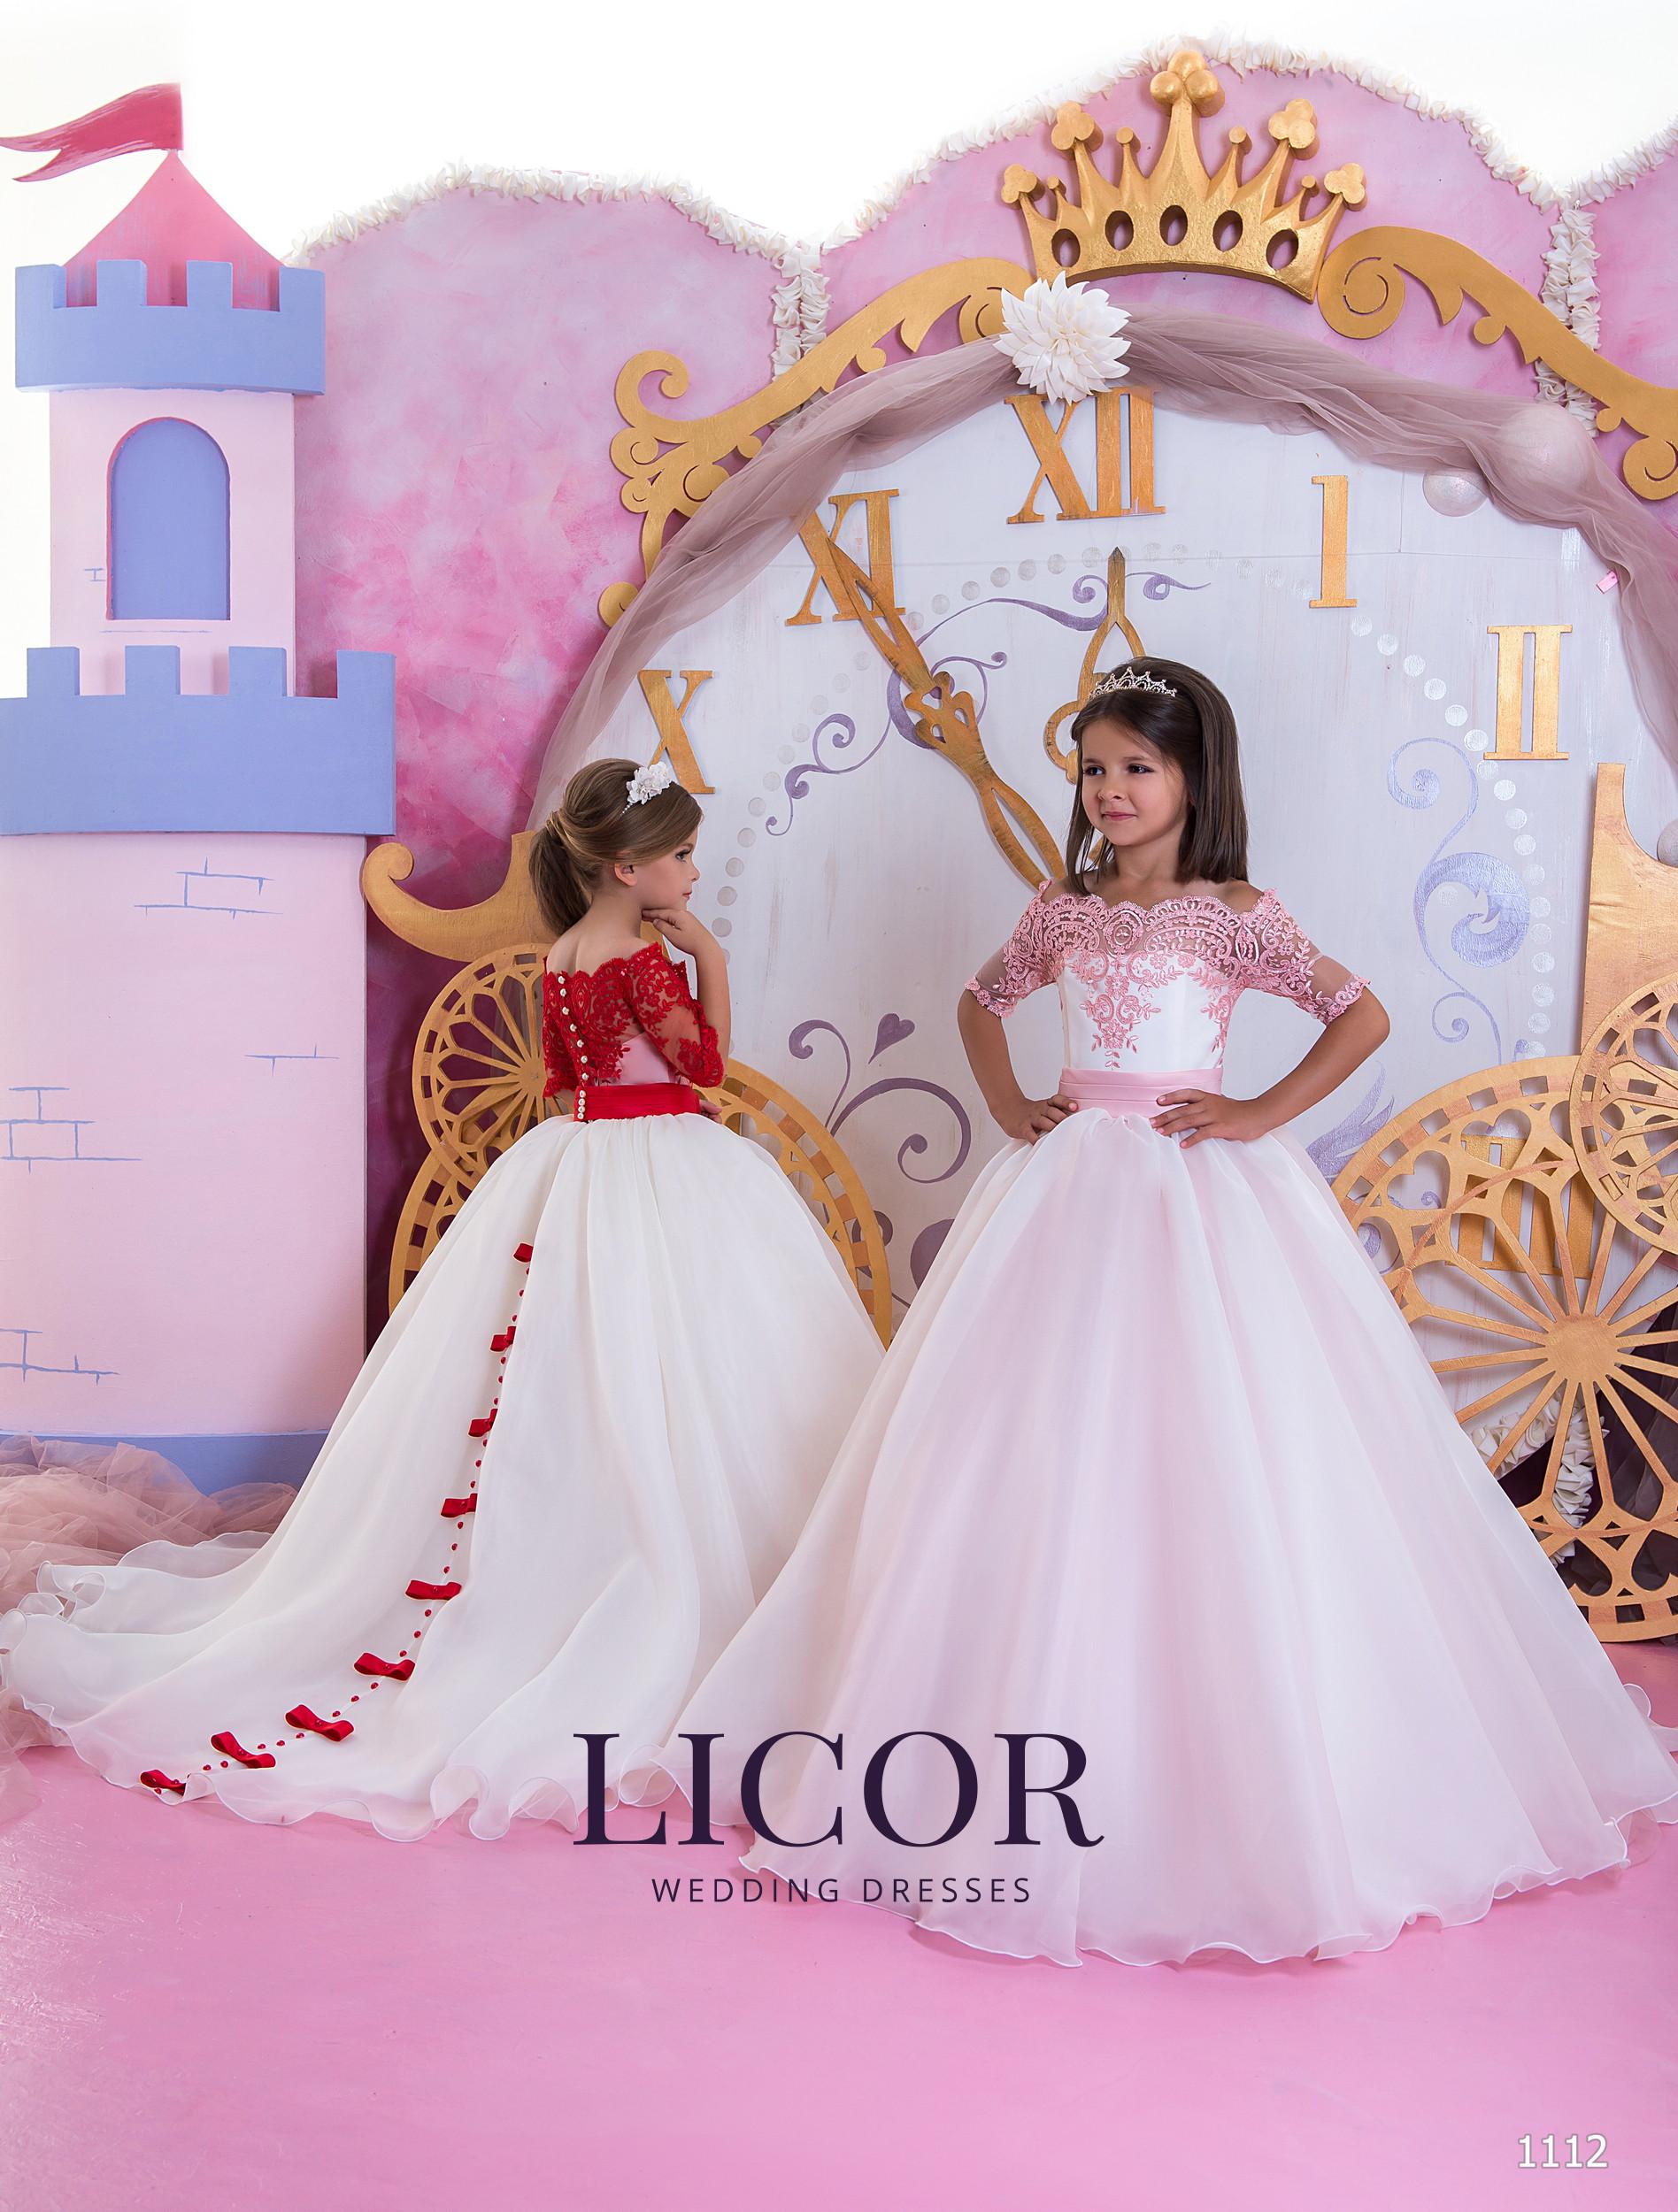 https://licor.com.ua/images/stories/virtuemart/product/1112(1).jpg